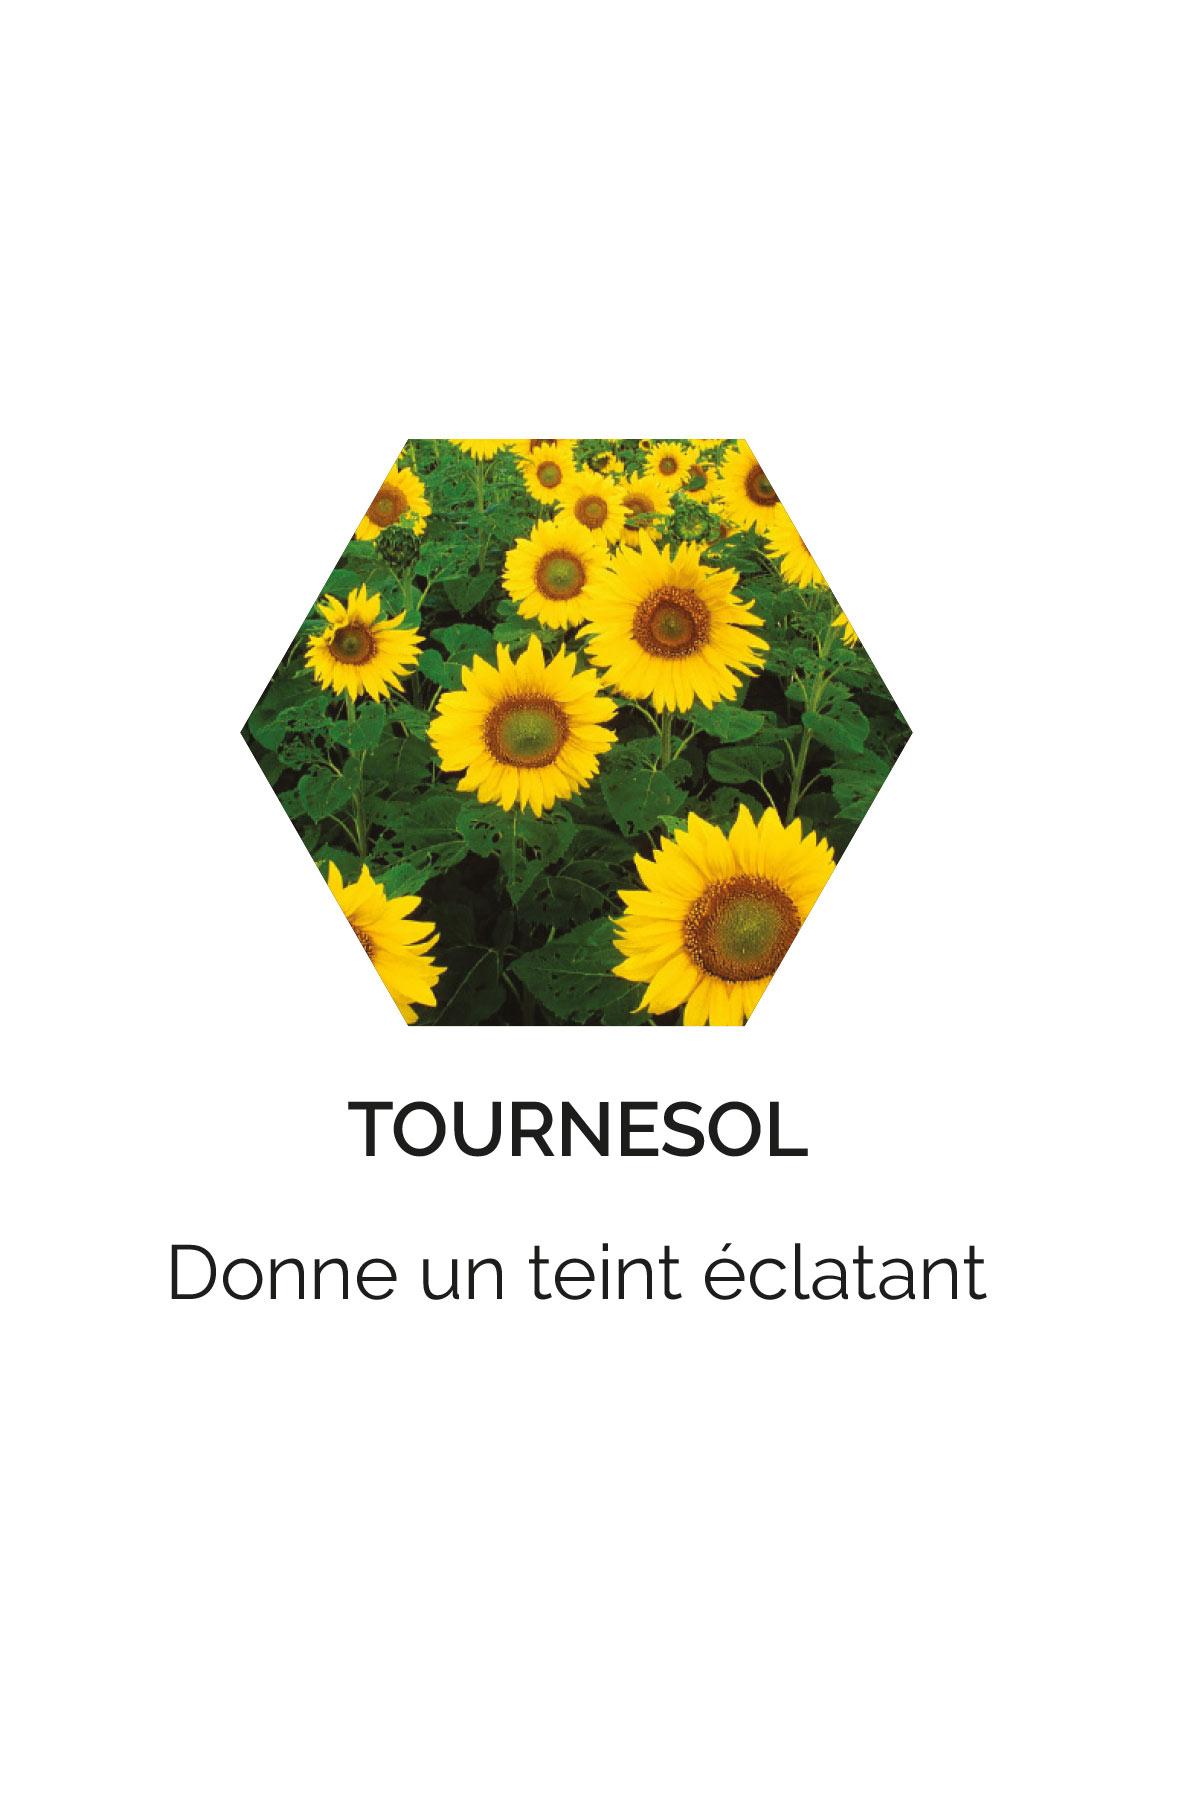 Tournesol